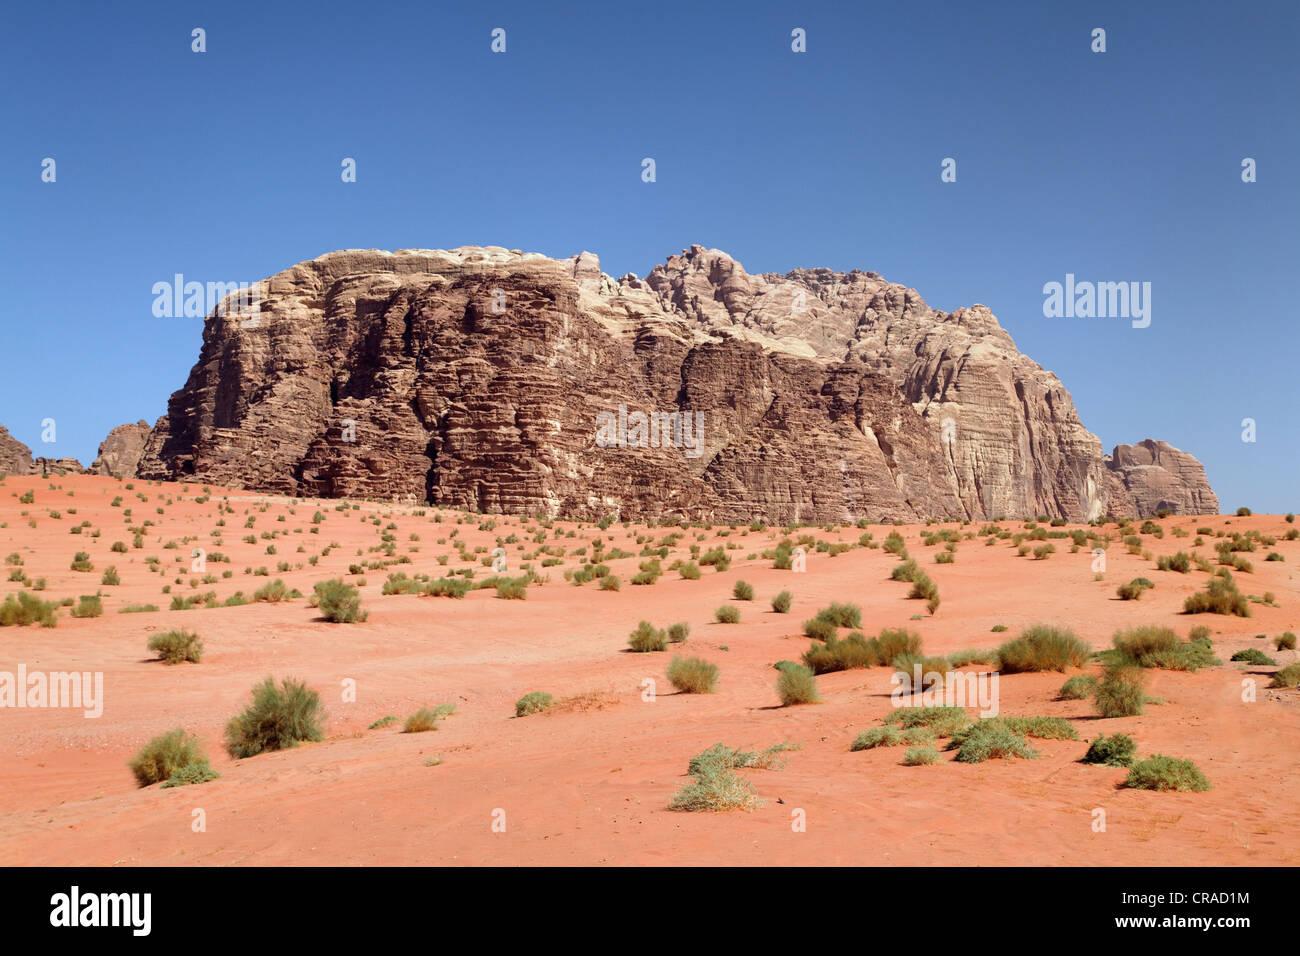 Mountains, vast plains and desert shrubs, Wadi Rum, Hashemite Kingdom of Jordan, Middle East, Asia - Stock Image